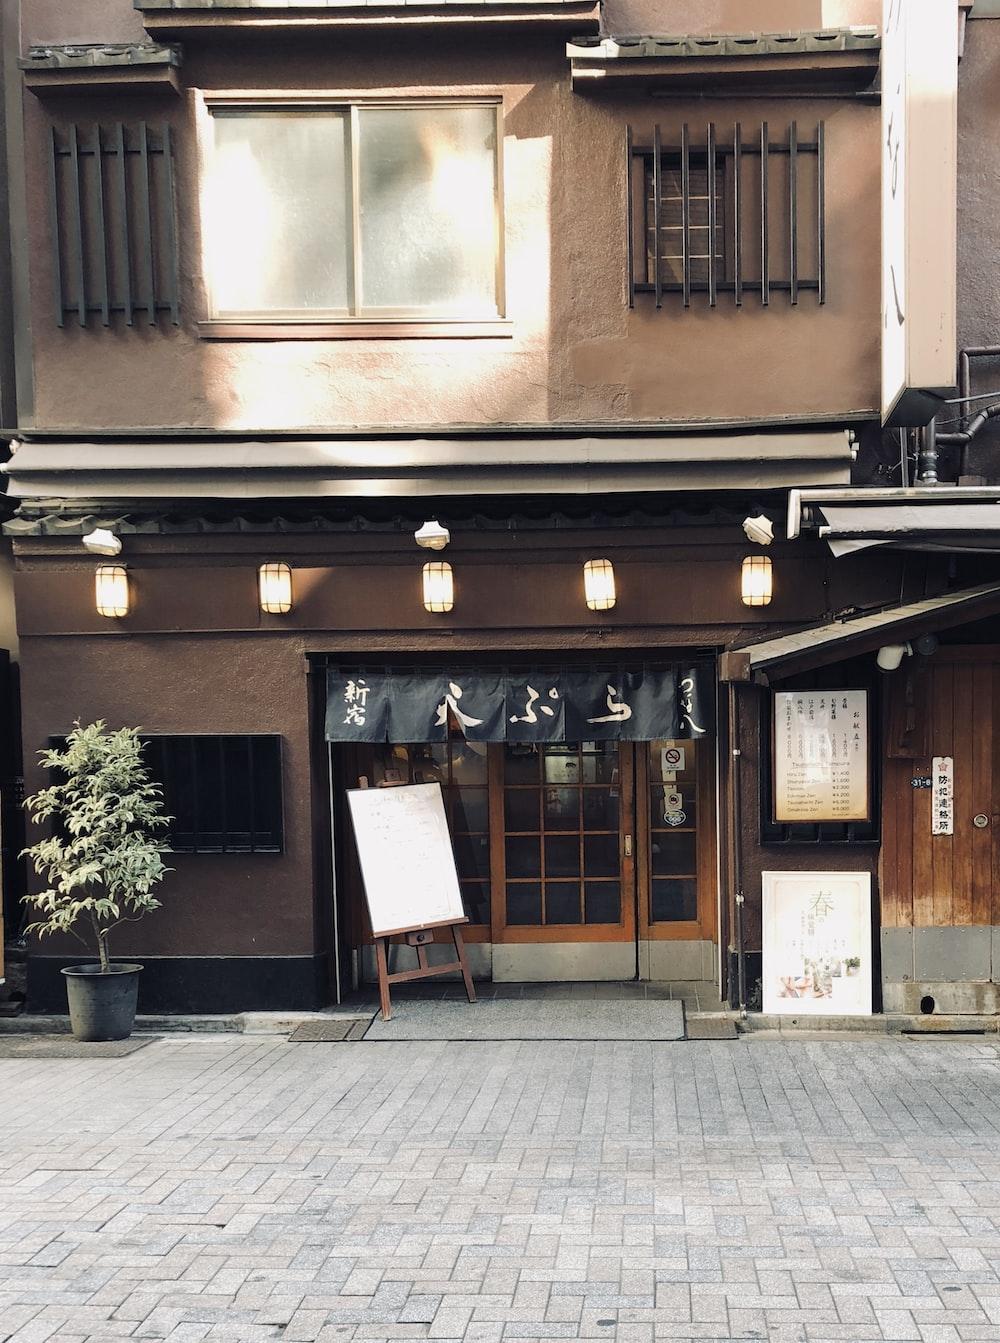 brown storefront during daytime